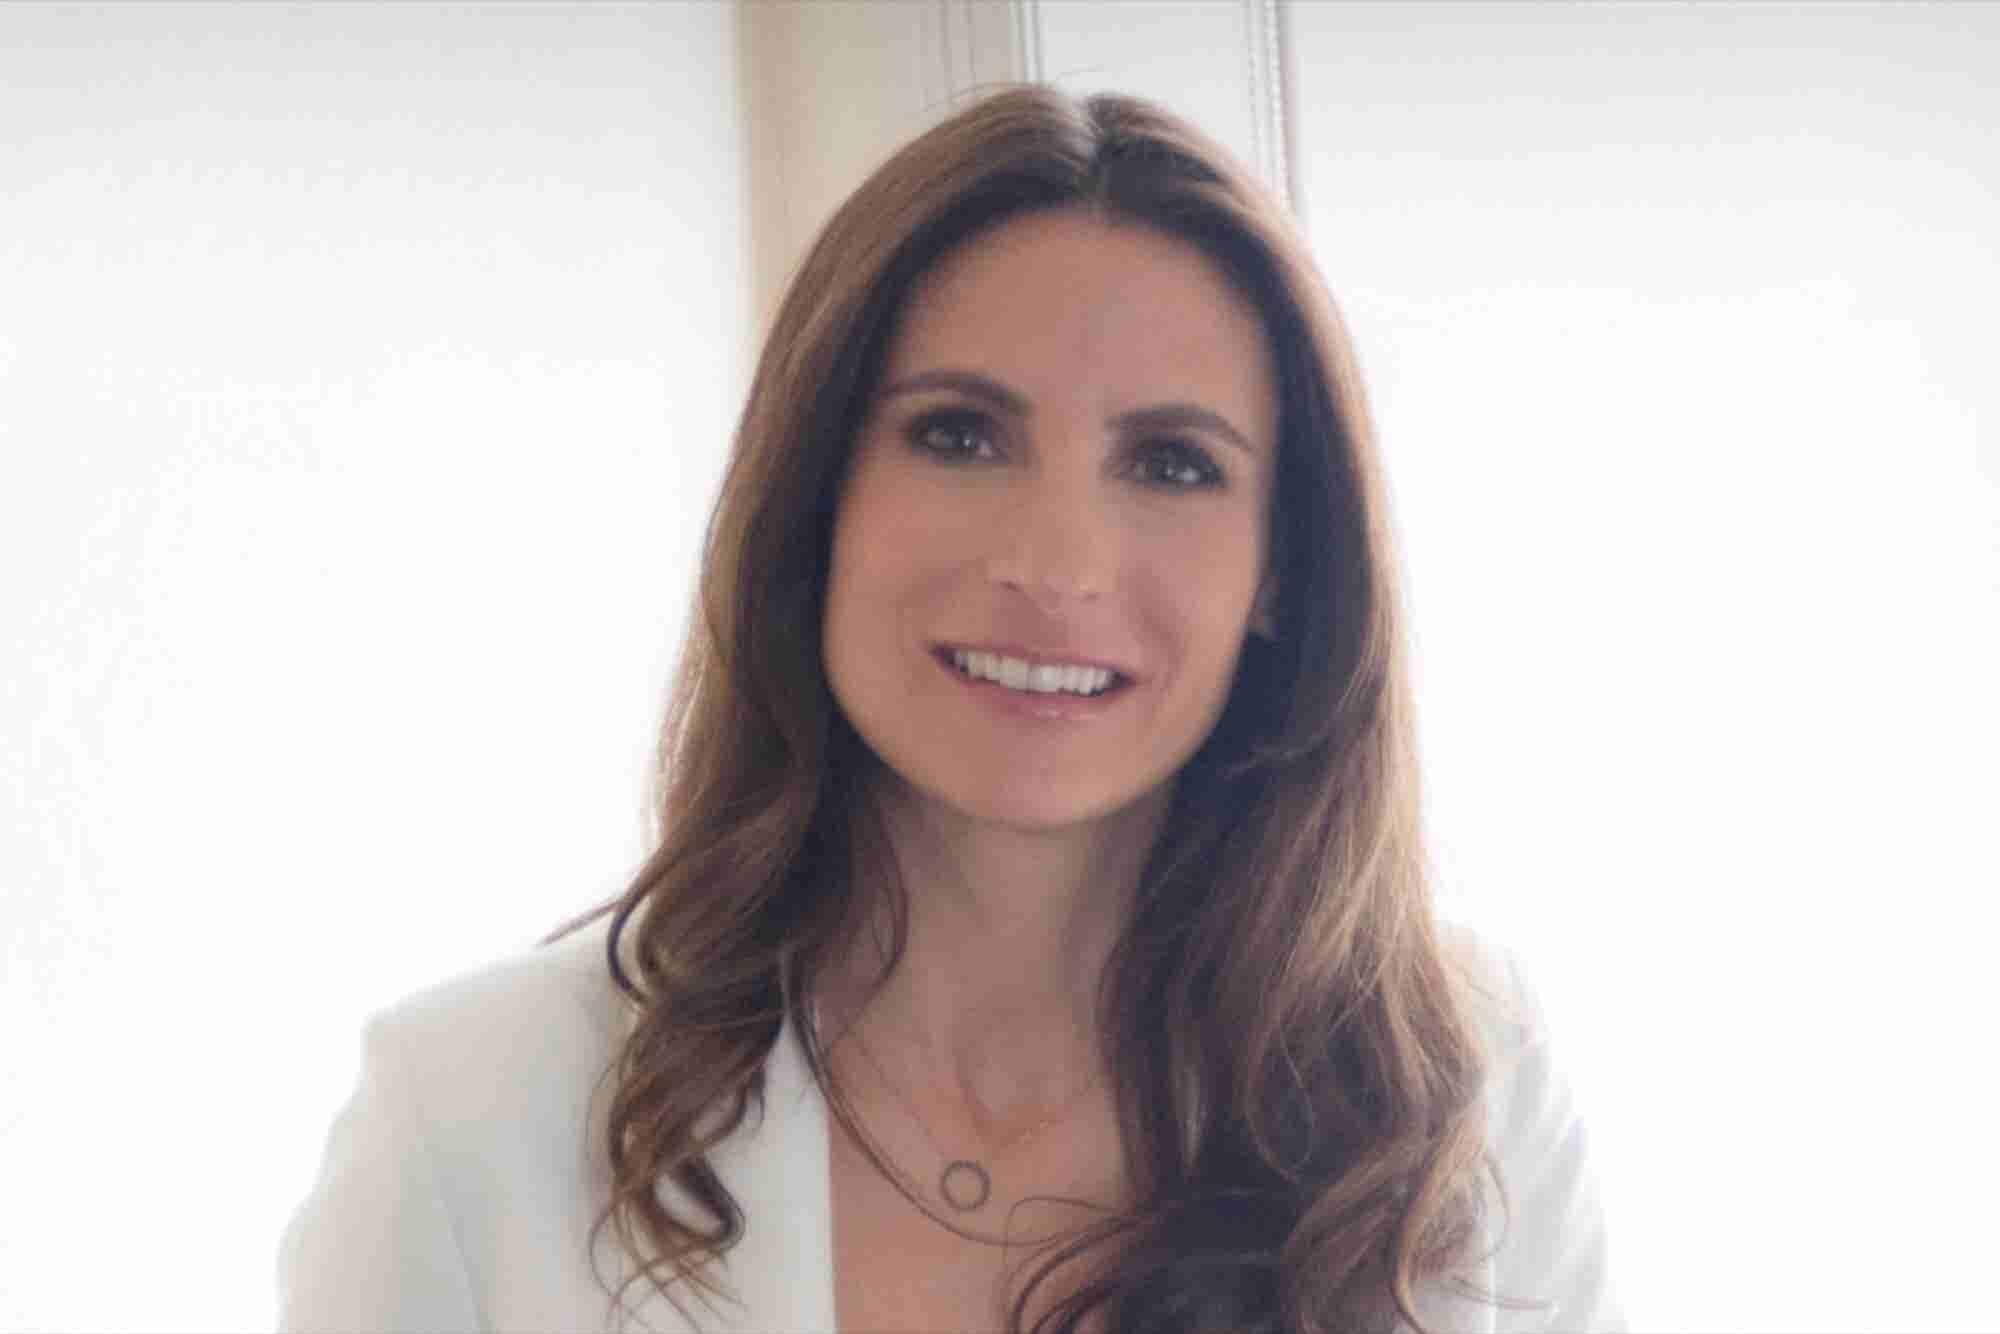 Meet the Entrepreneur Behind Kate Middleton's Maternity Style